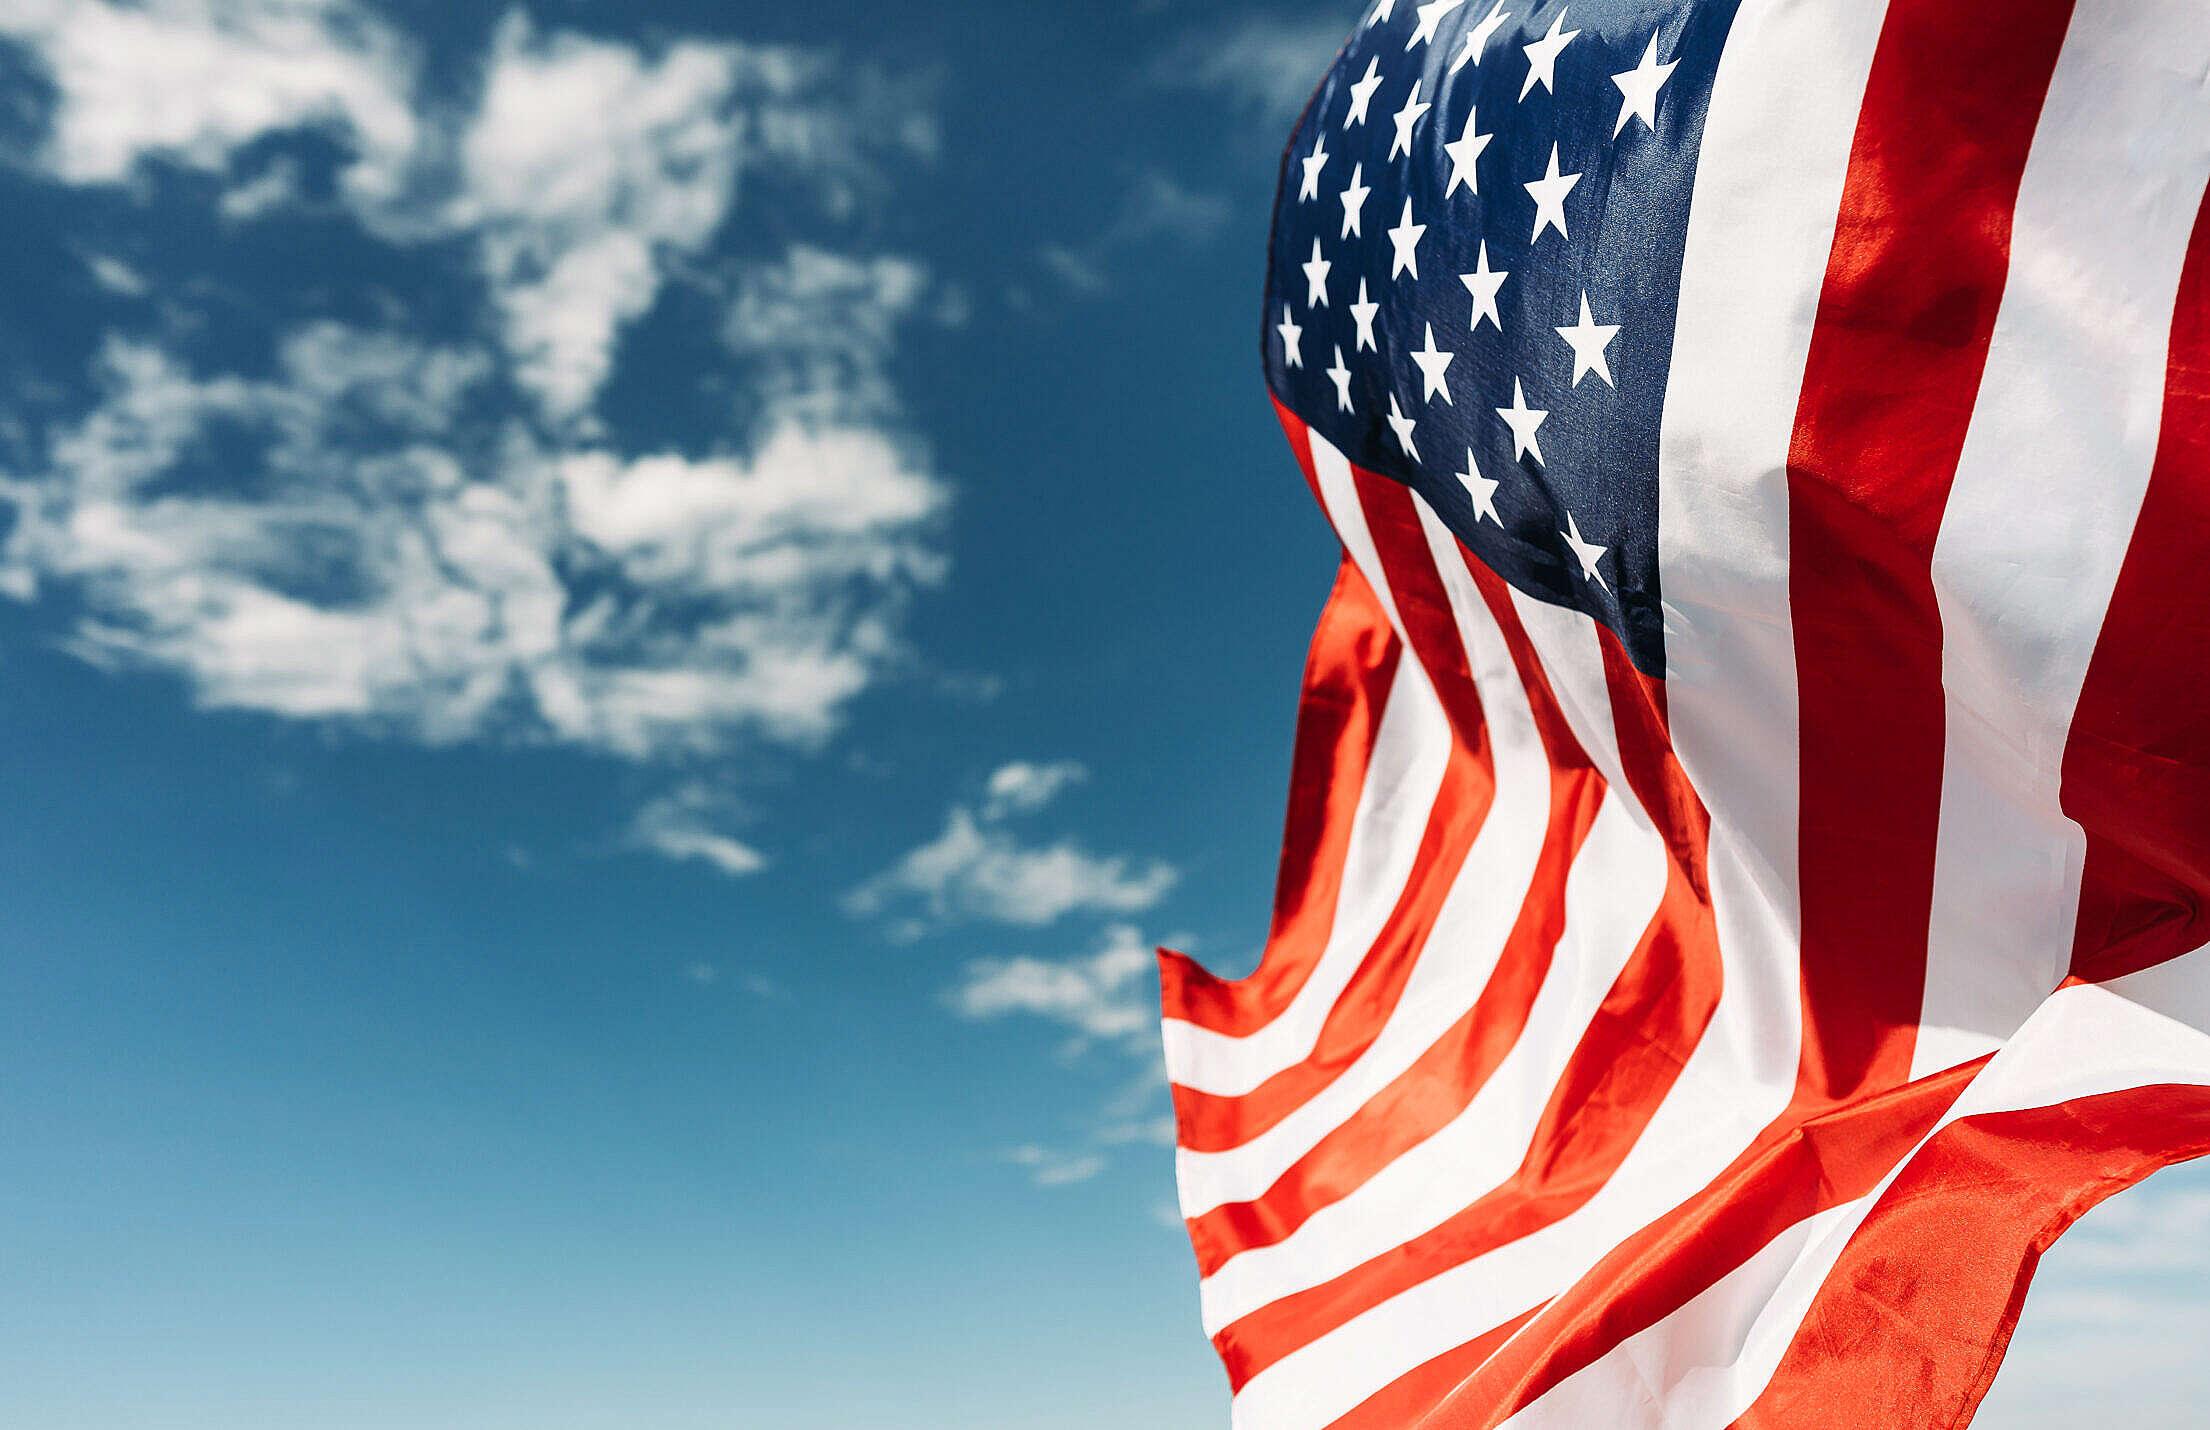 Waving American Flag Free Stock Photo